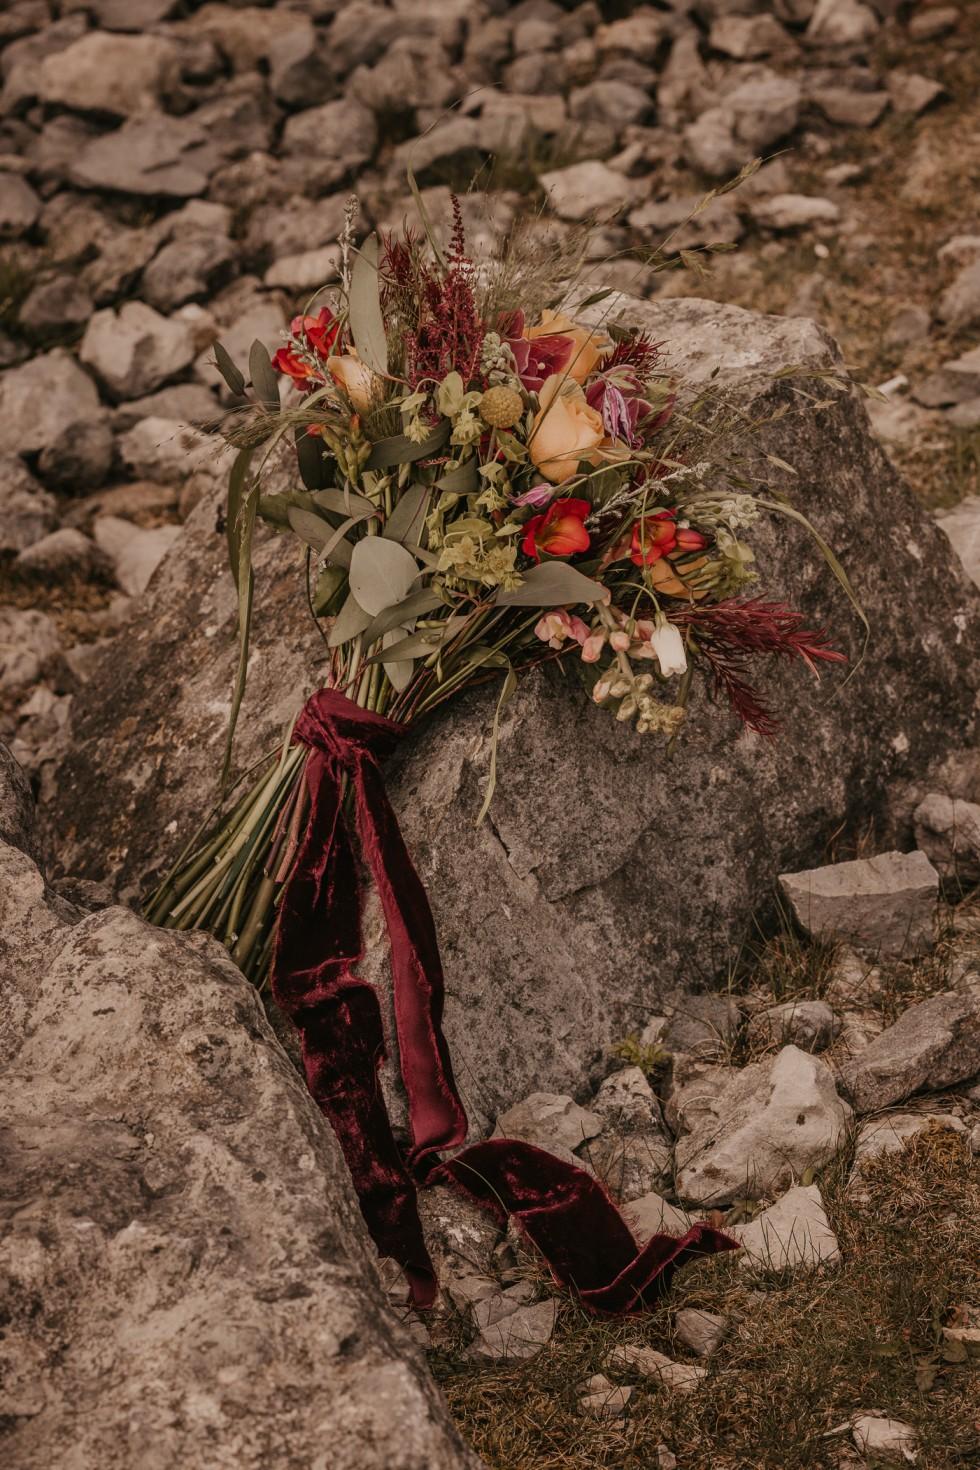 wild wedding flowers - wedding wild flowers - casual wedding flowers - bohemian wedding bouquet